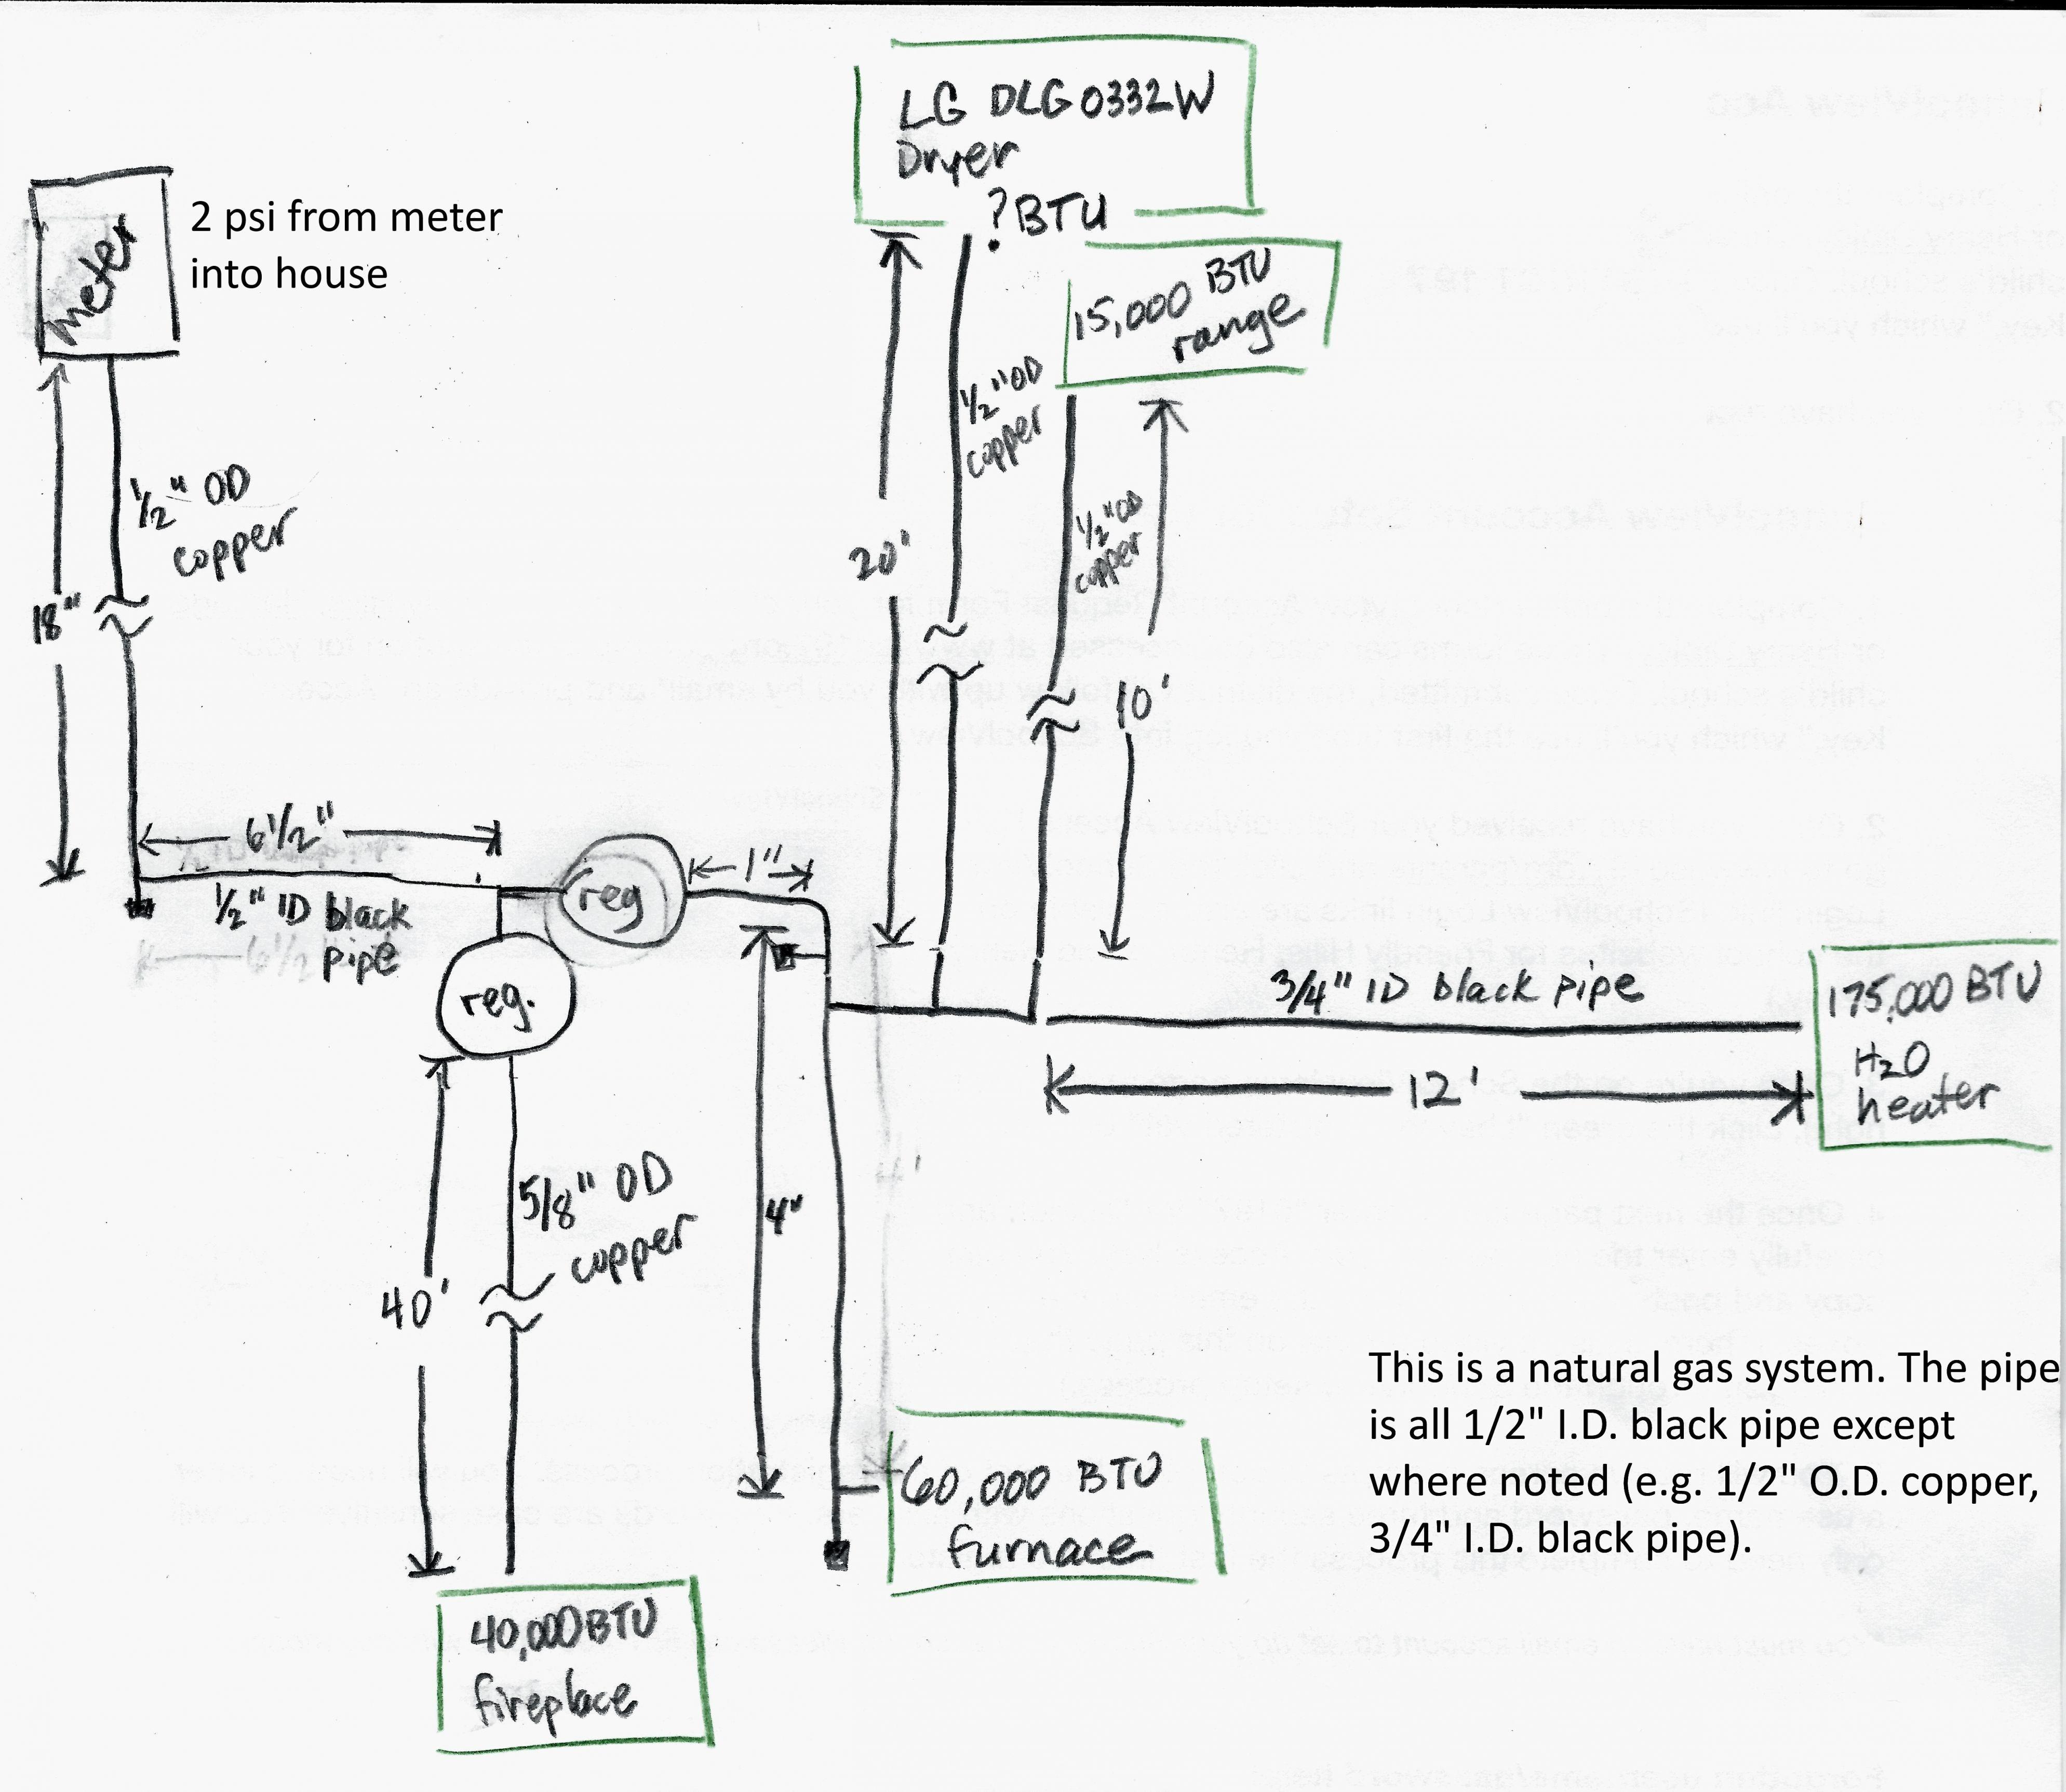 Immersion Heater Wiring Diagram Bajaj Immersion Water Heater Wiring Diagram Refrence Immersion Of Immersion Heater Wiring Diagram